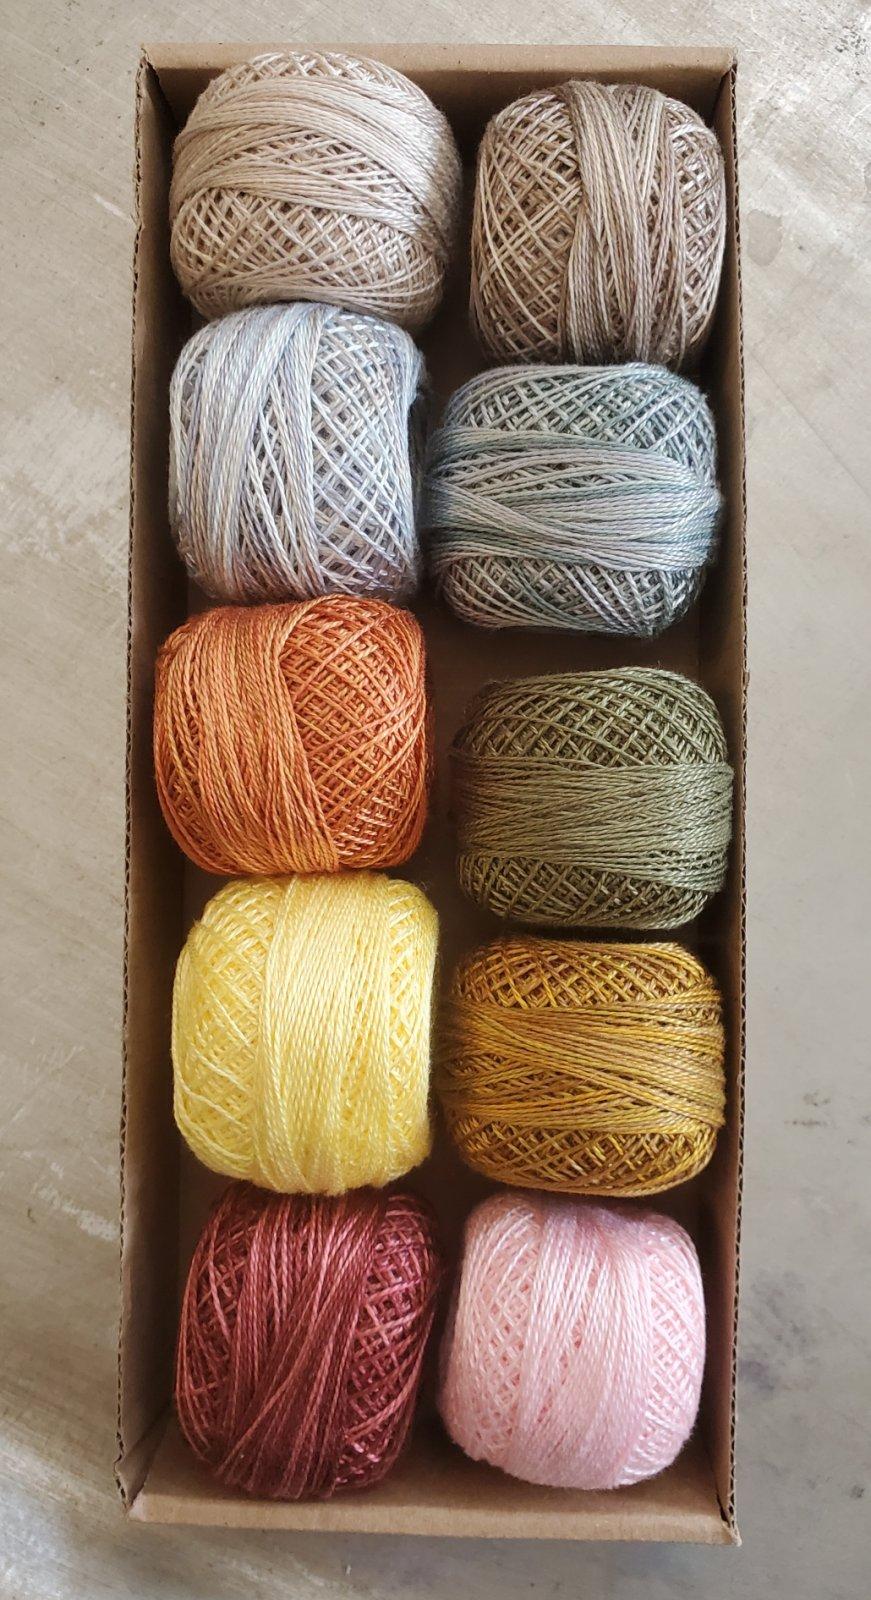 Garden Gals April Thread Pack